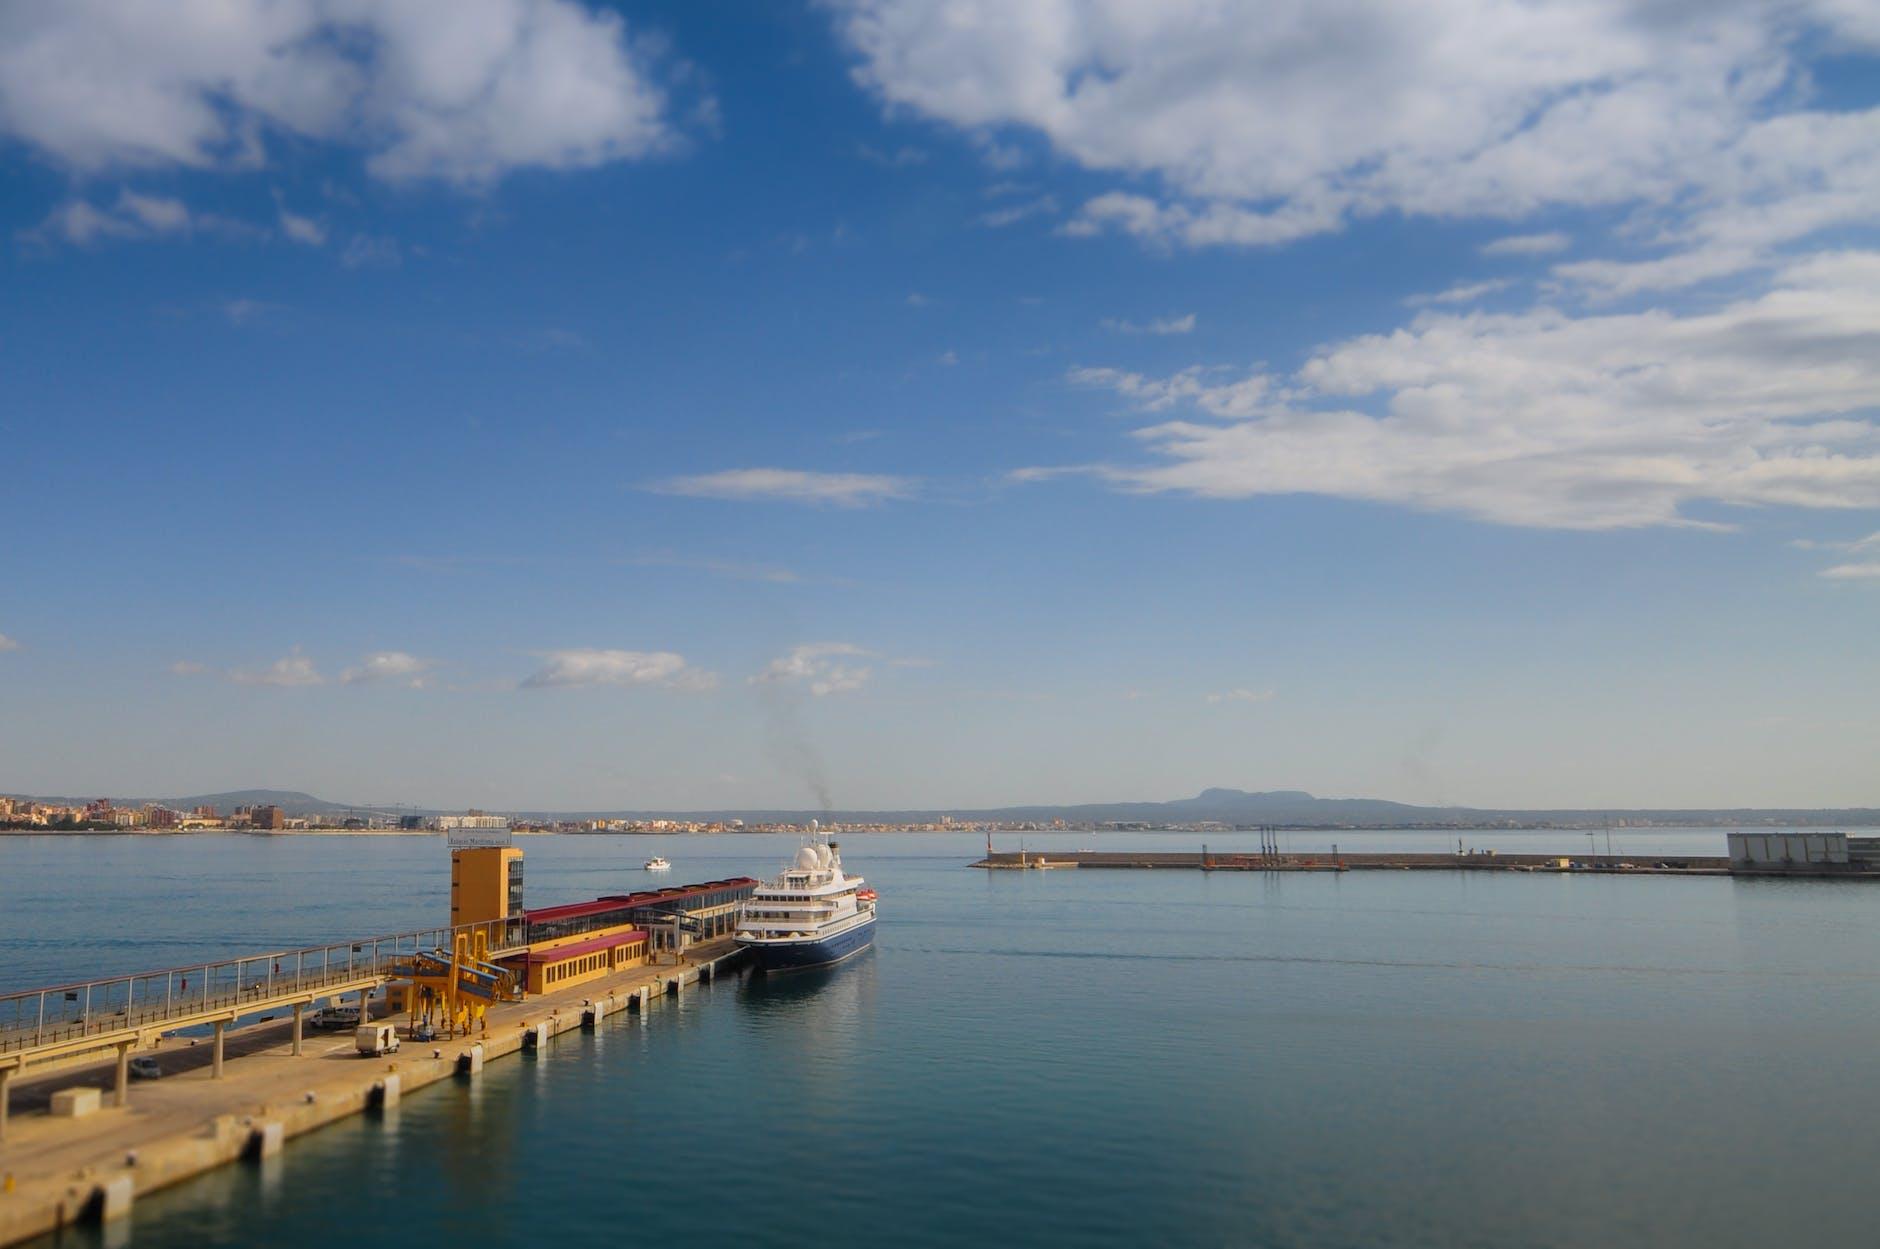 paseo romantico barco barcelona